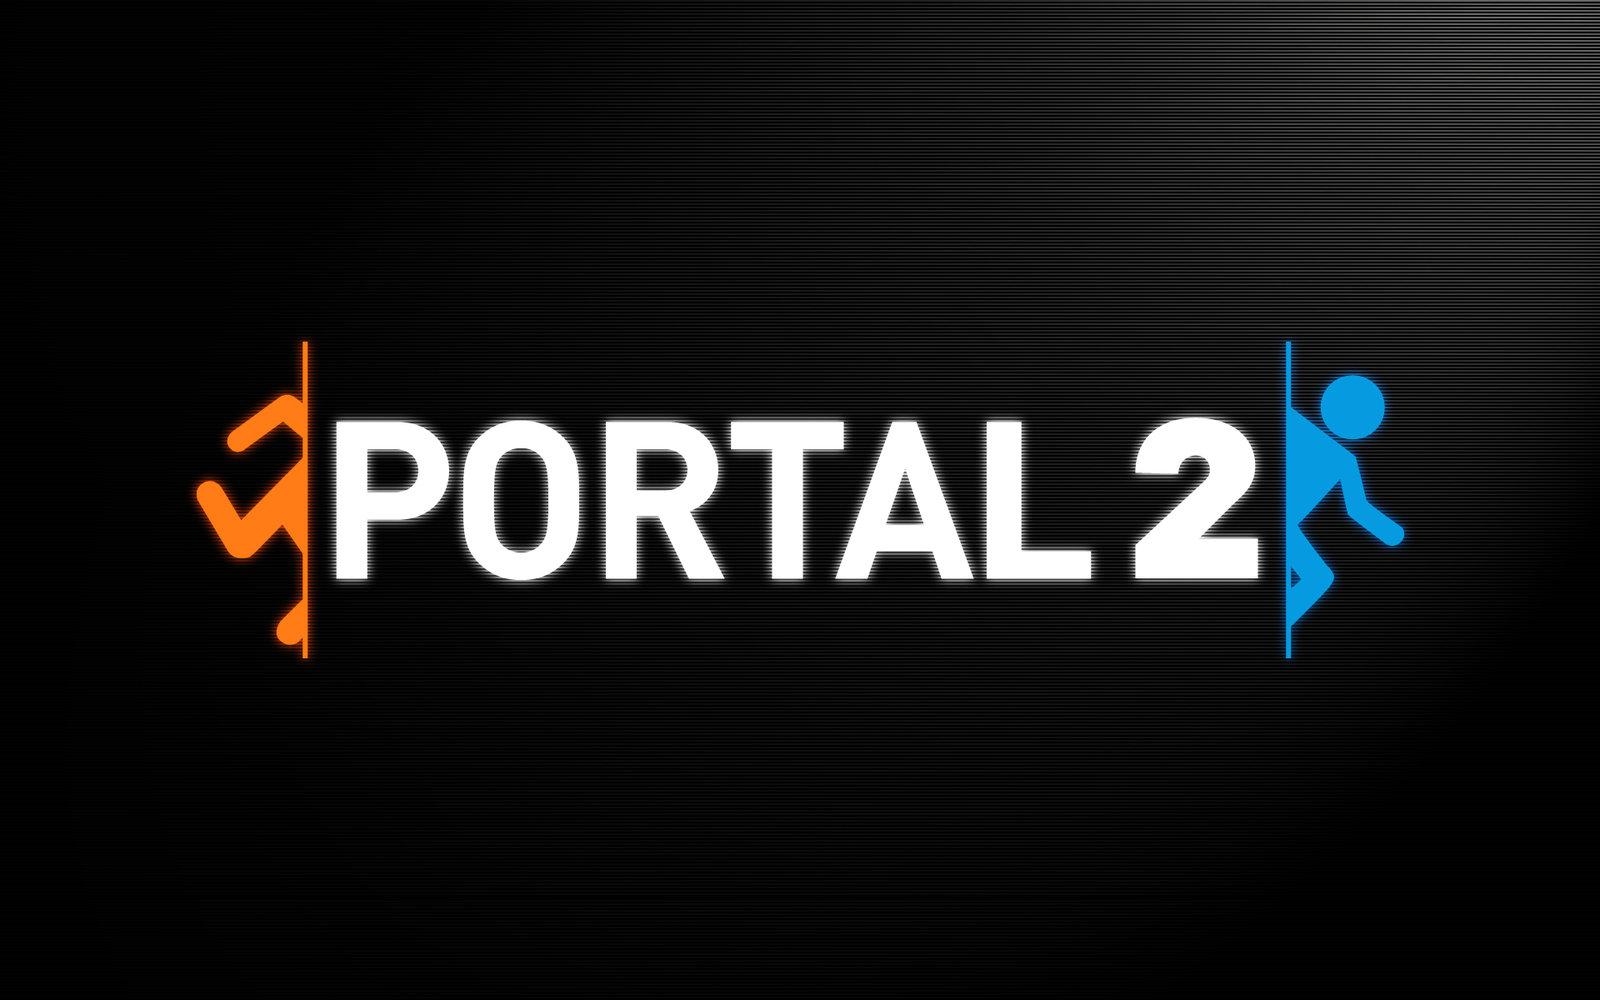 design notes portal 2